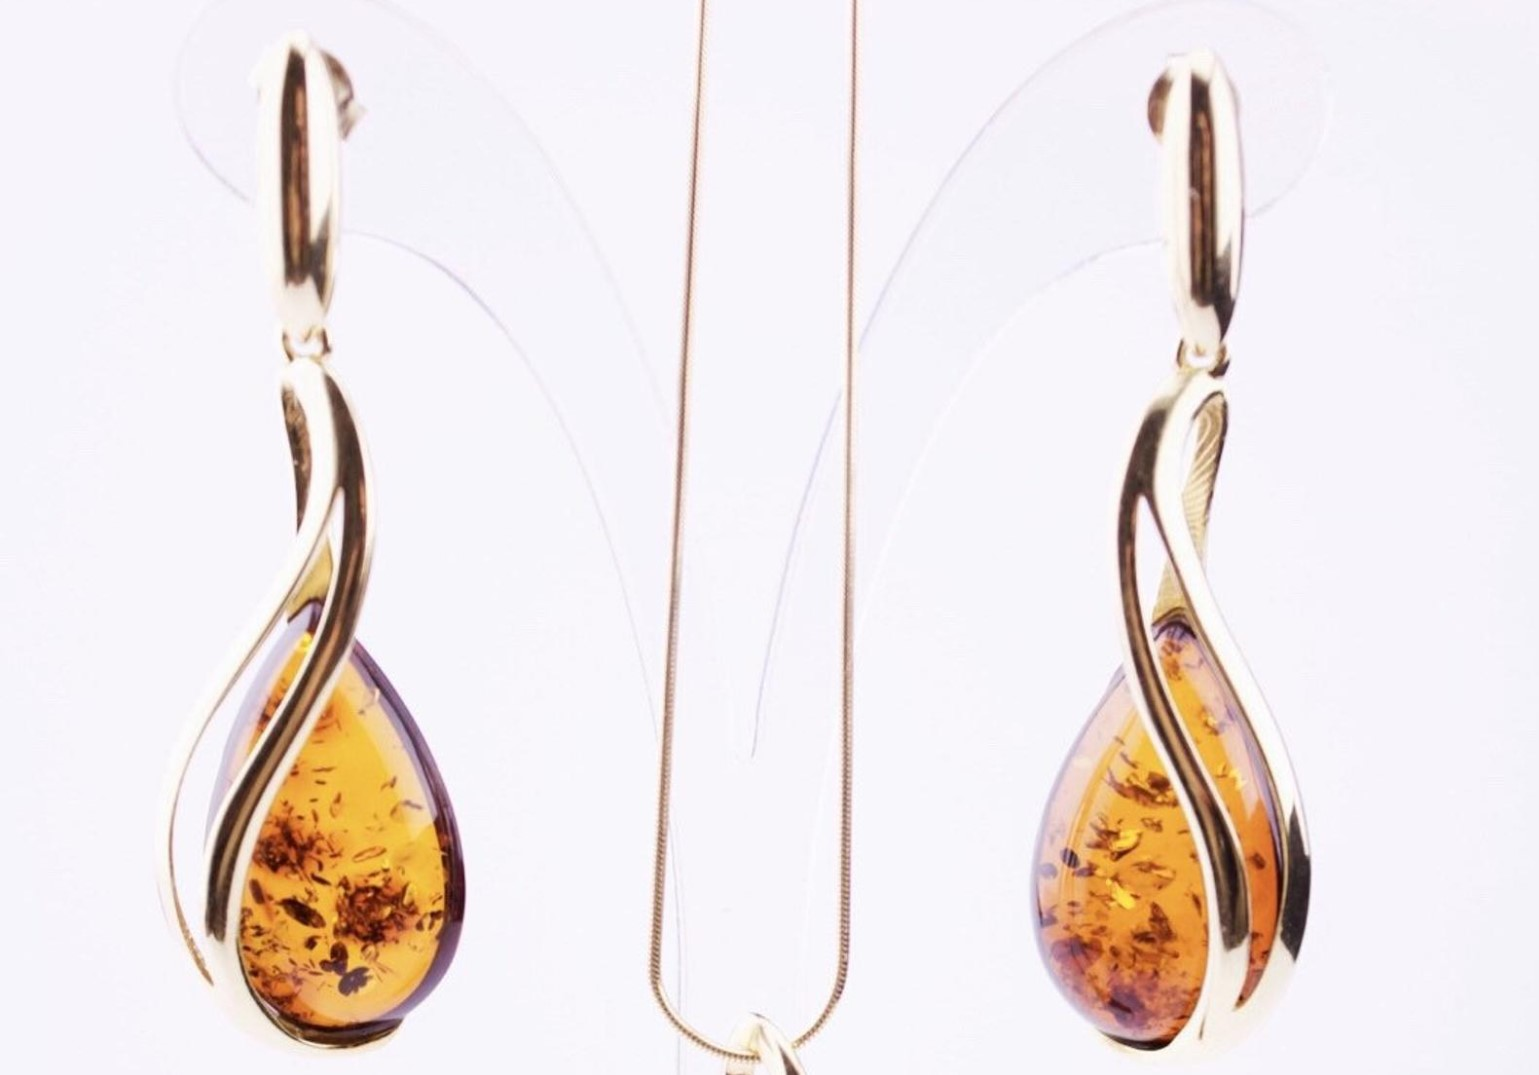 Laser Engraved Earrings Personalized Earrings Silver-Rose Gold Earrings Diva Custom Earrings Diva Earrings